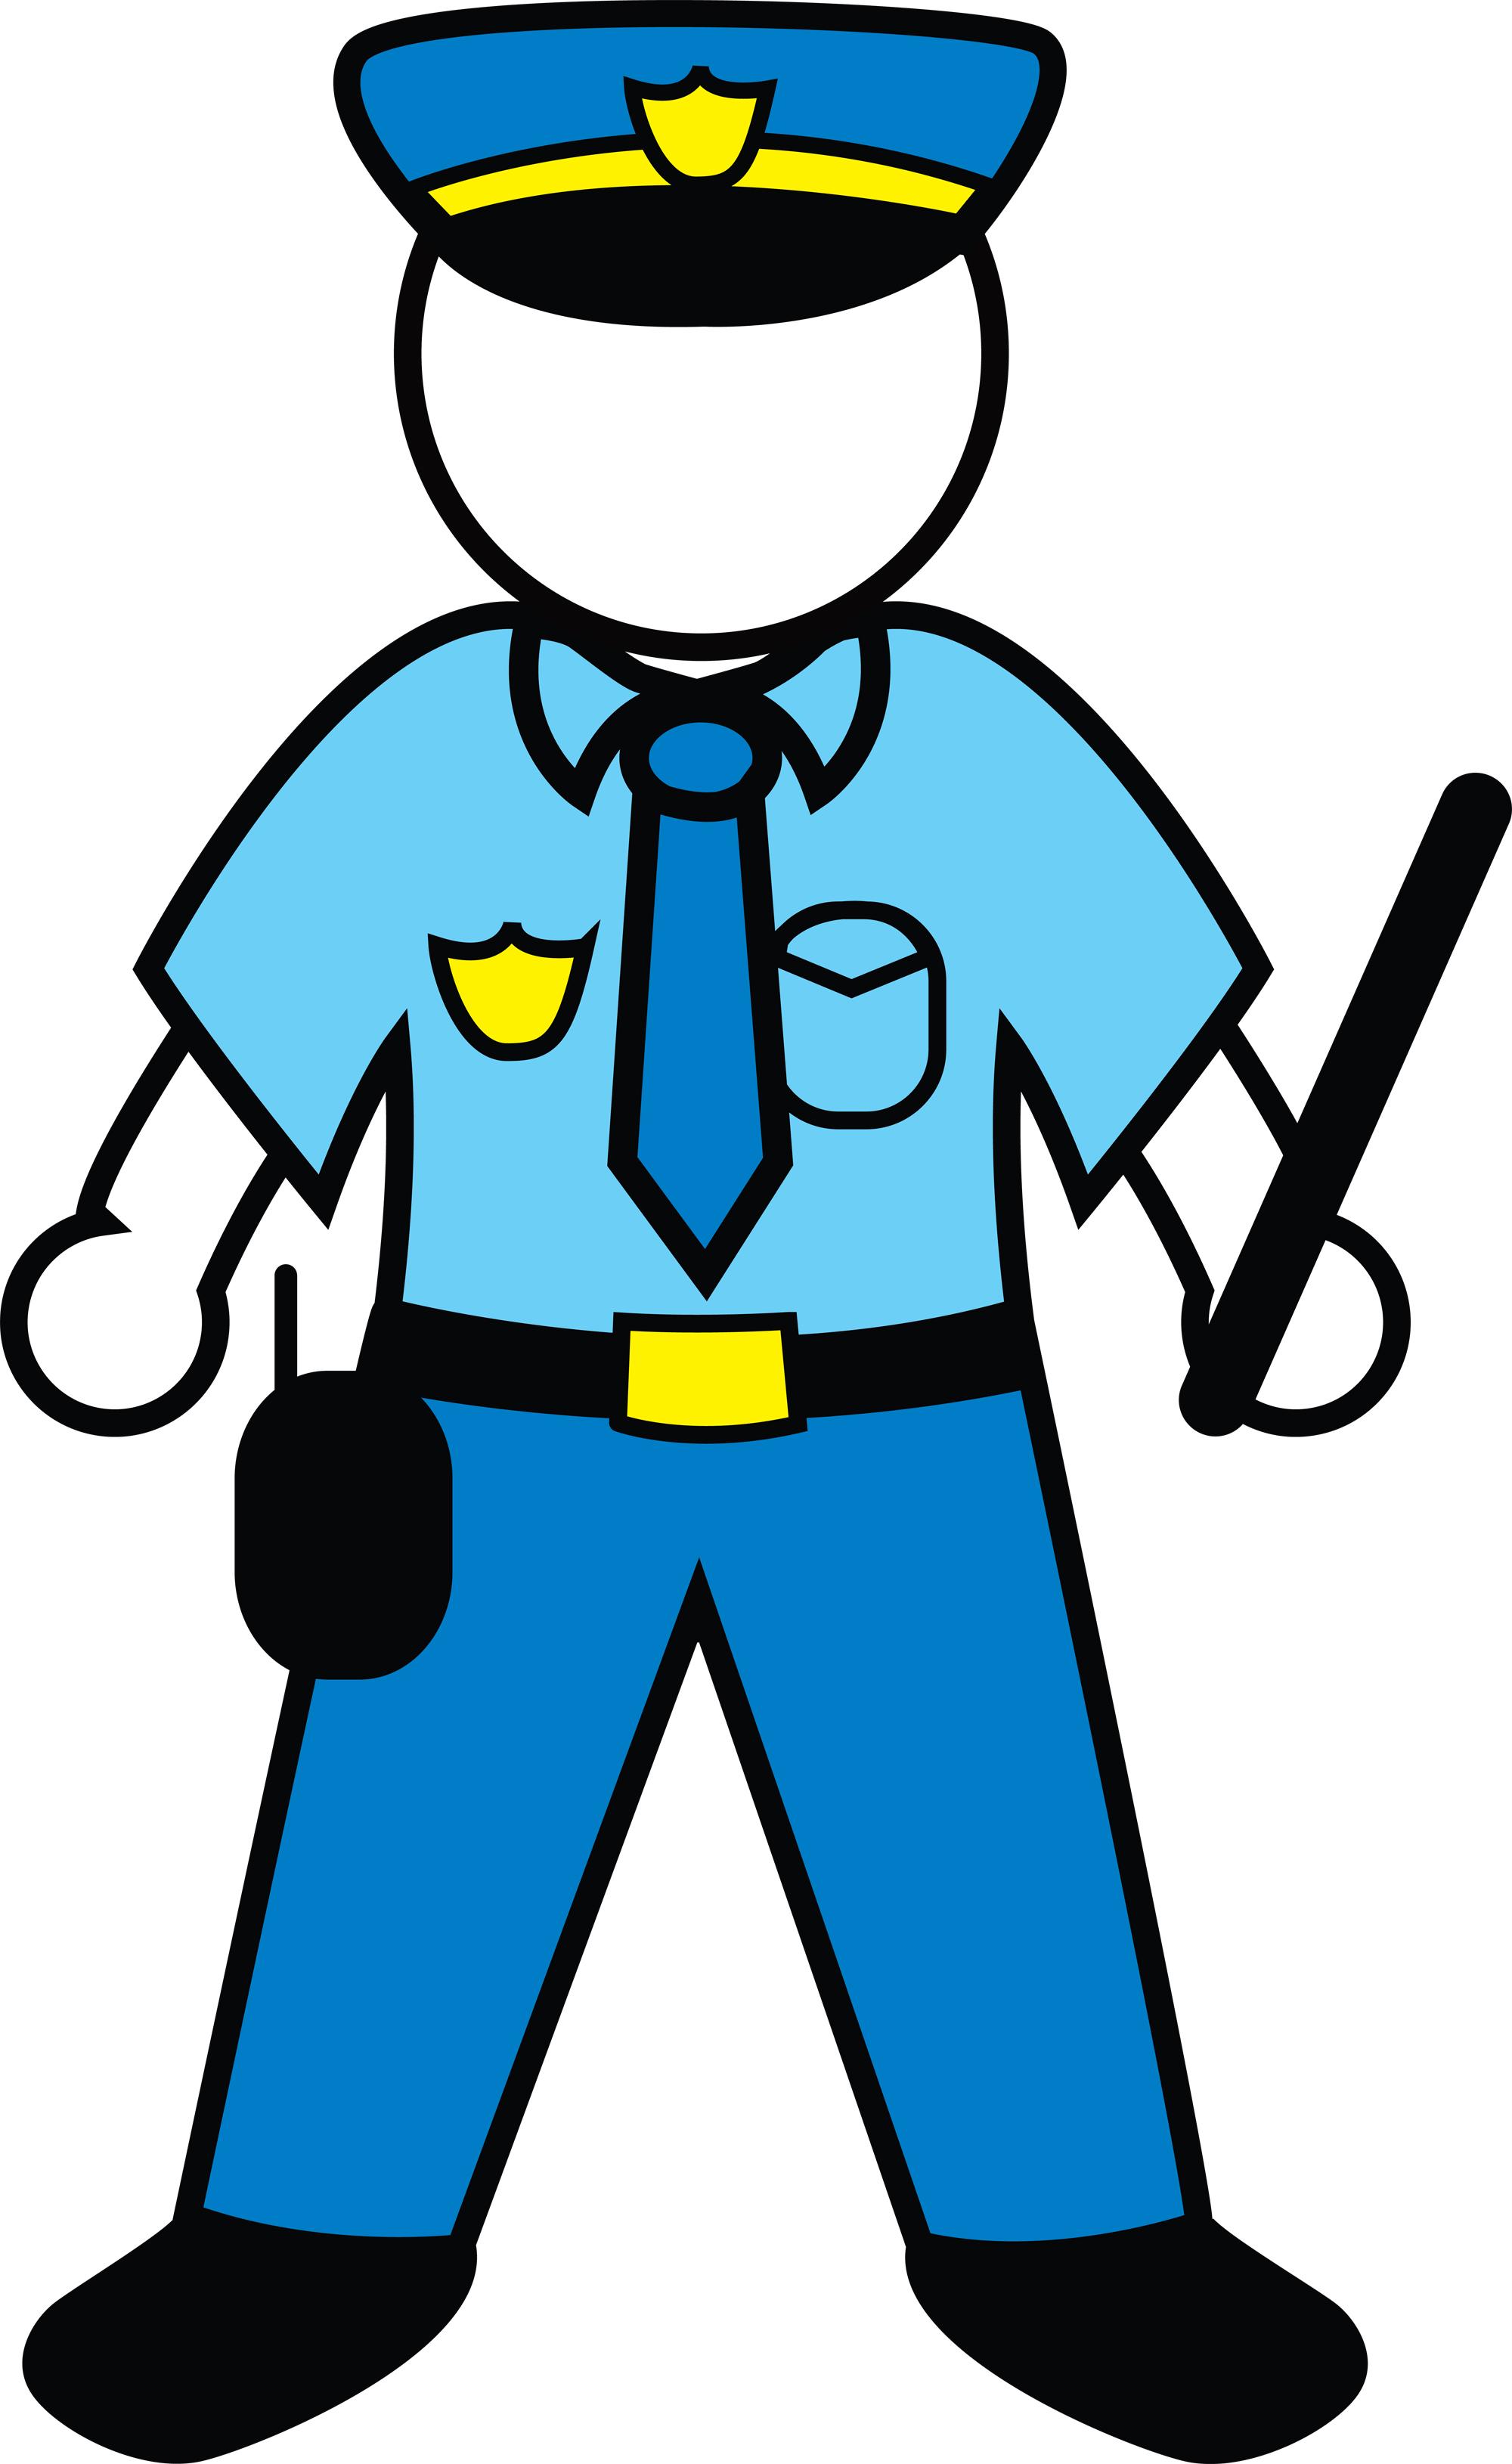 Policeman clipart uniform. Clip art police officer